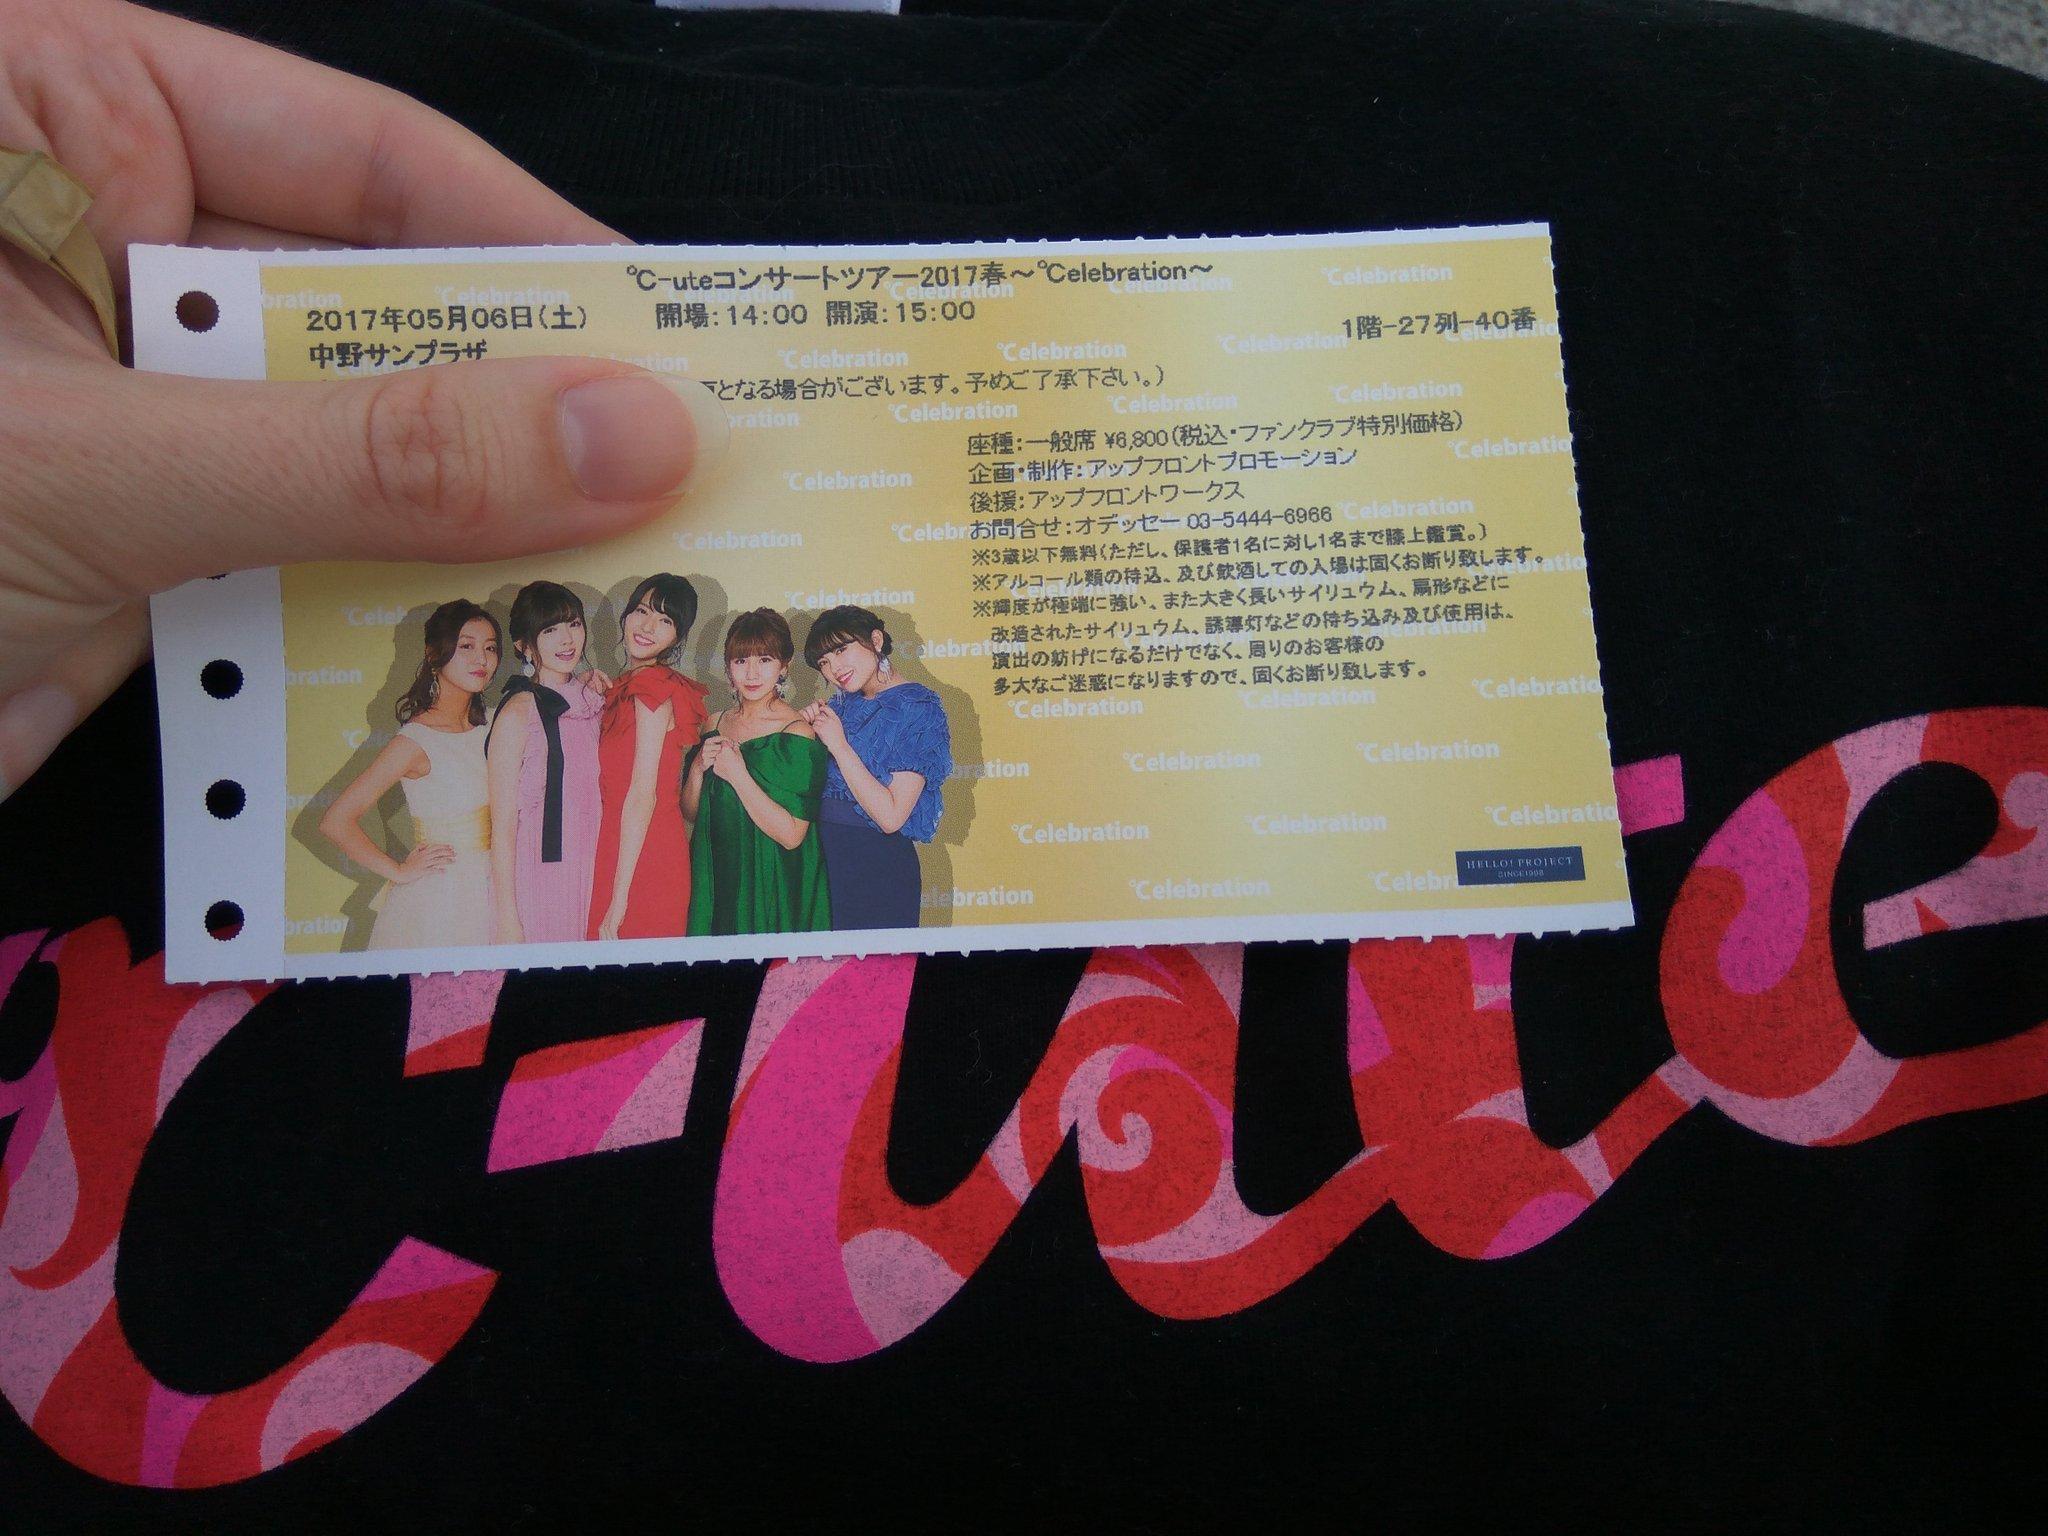 cute celebration 2017 idols